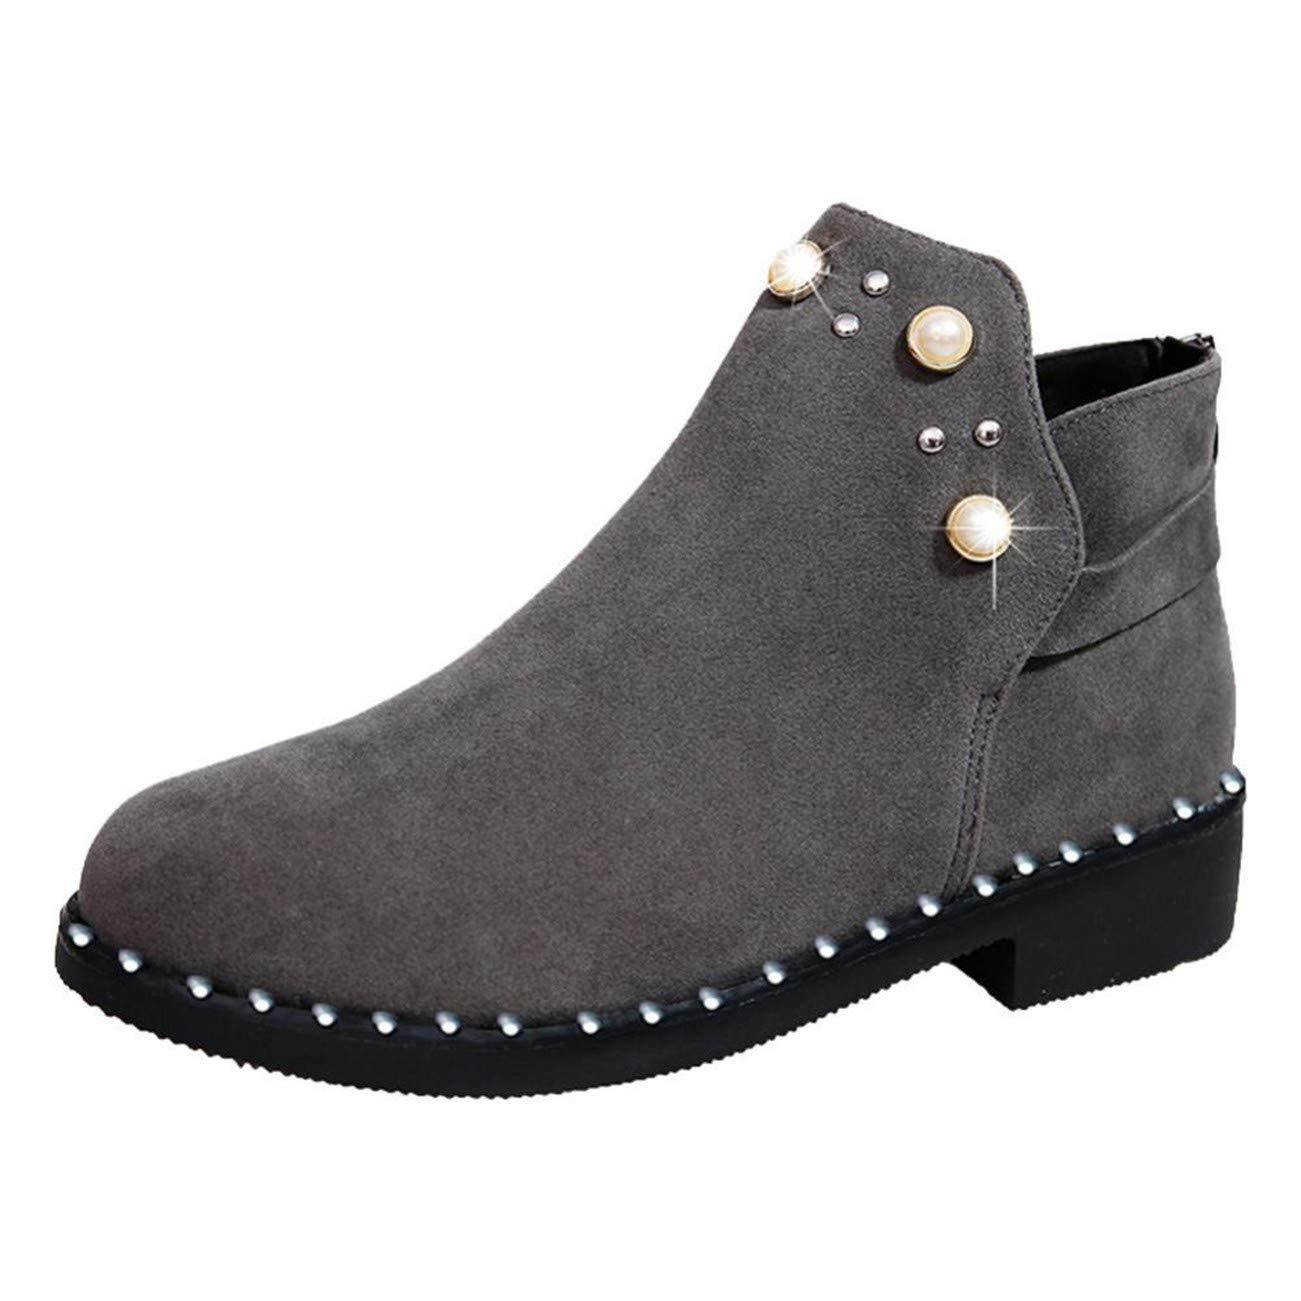 HCFKJ Chaussures Femme Vintage Femmes Boot Chaussures Perle Martain Bottes Daim Plat Bottes Zipper Bottine HCFKJ-Js